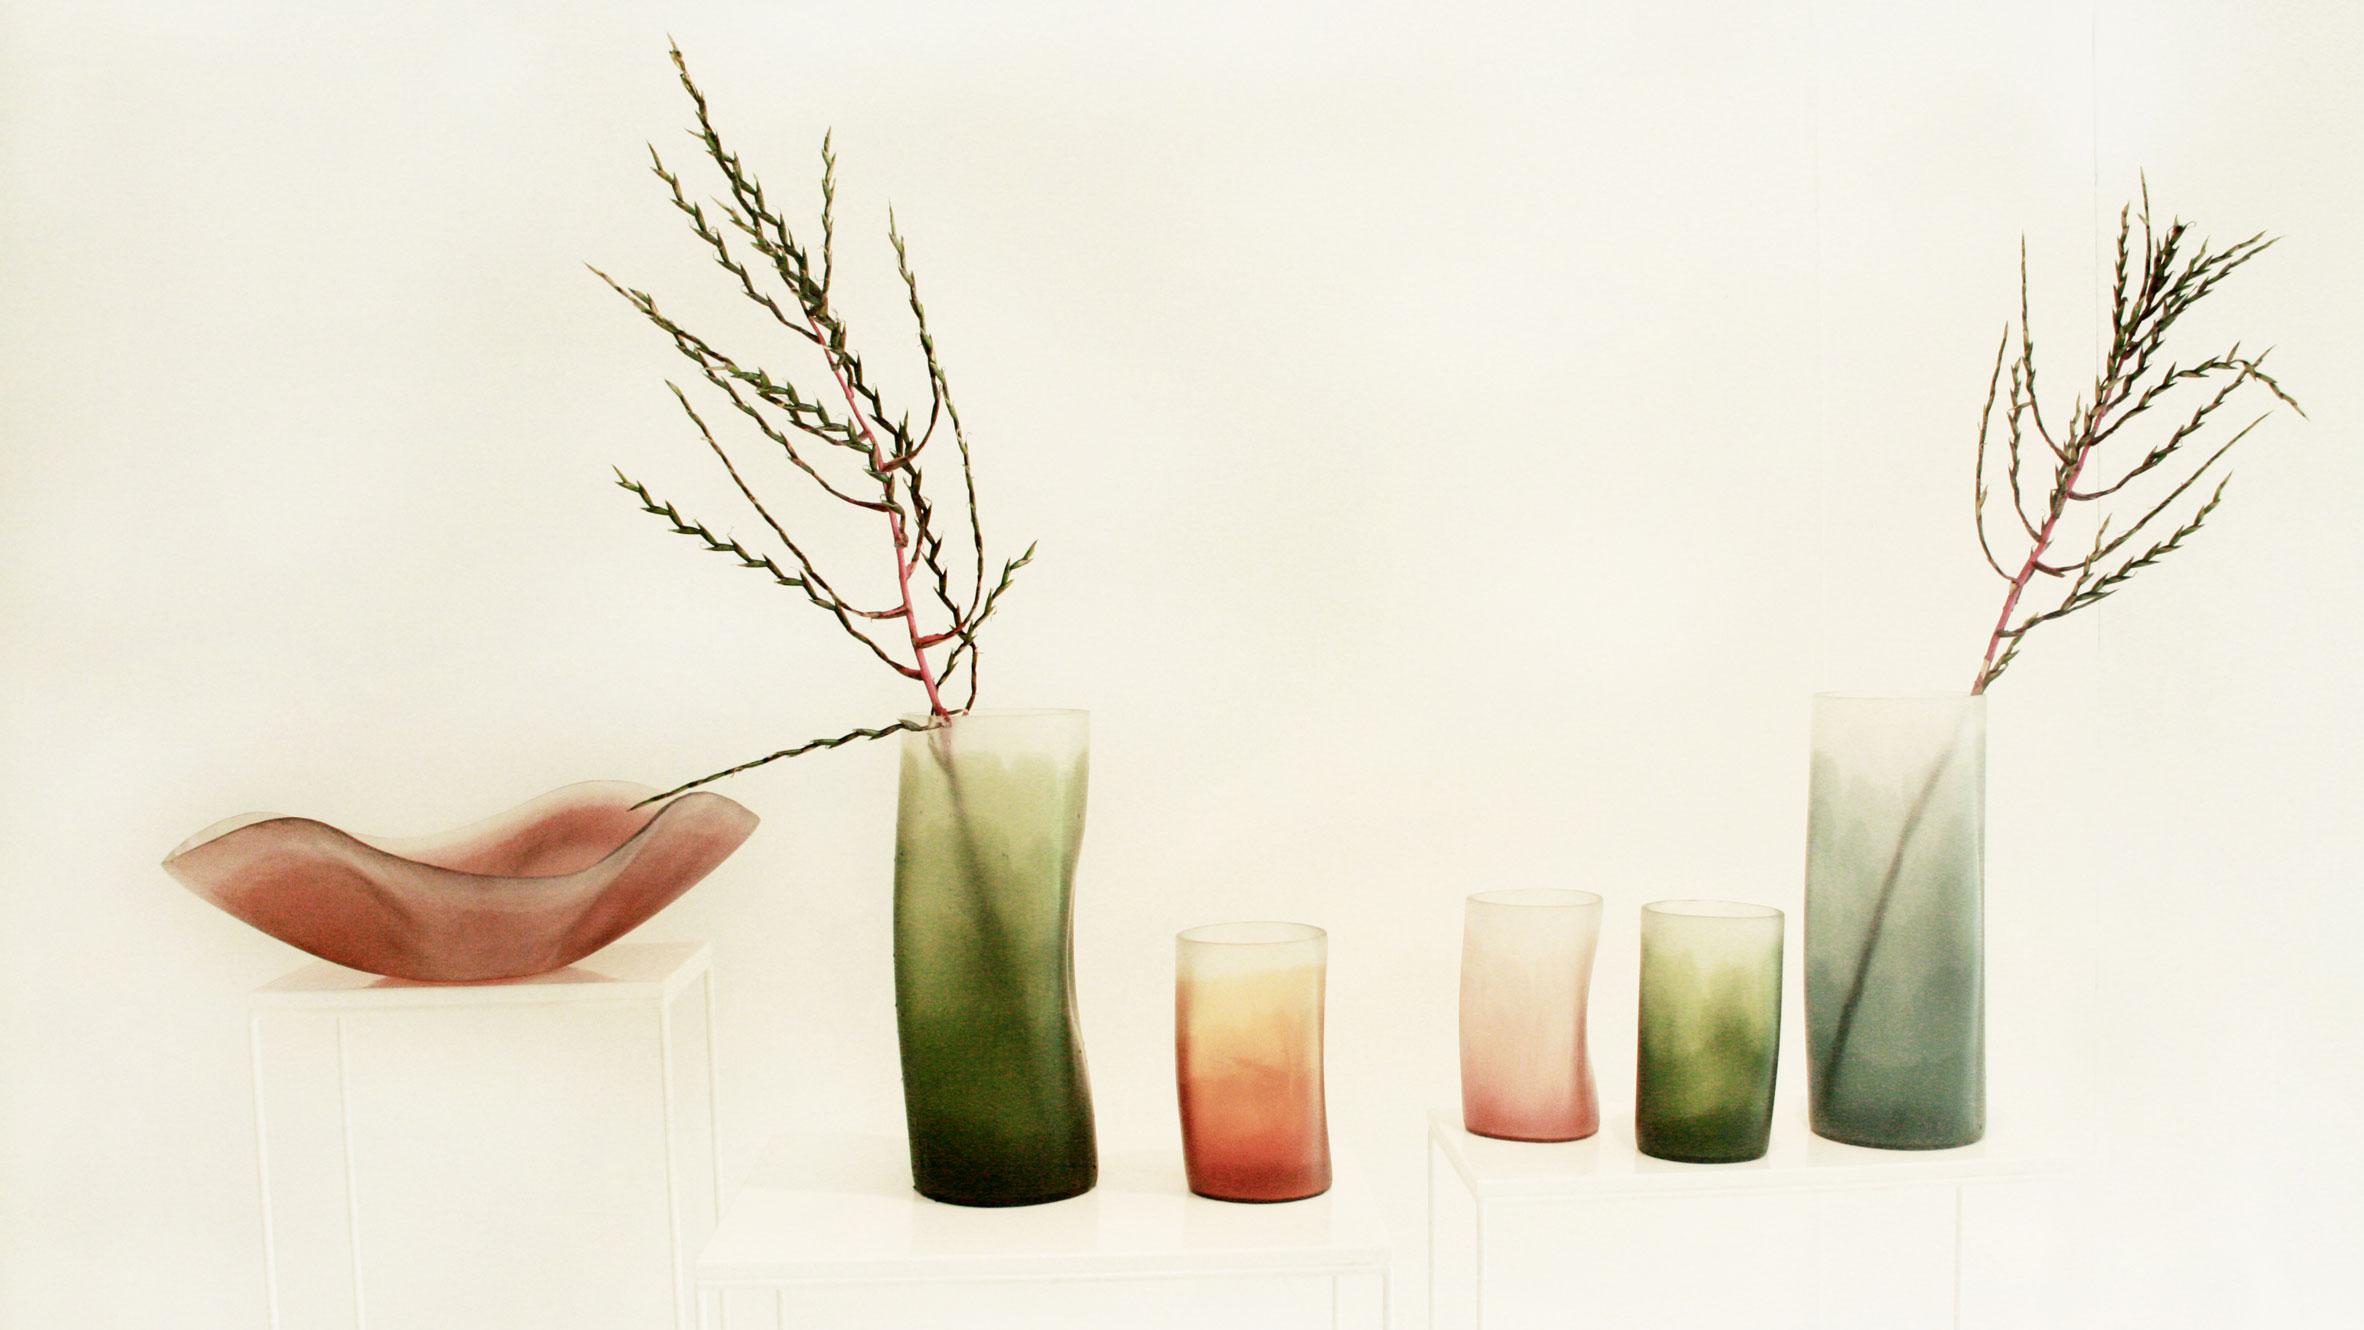 resin-vases-monica-calderon-design-week-mexico_dezeen